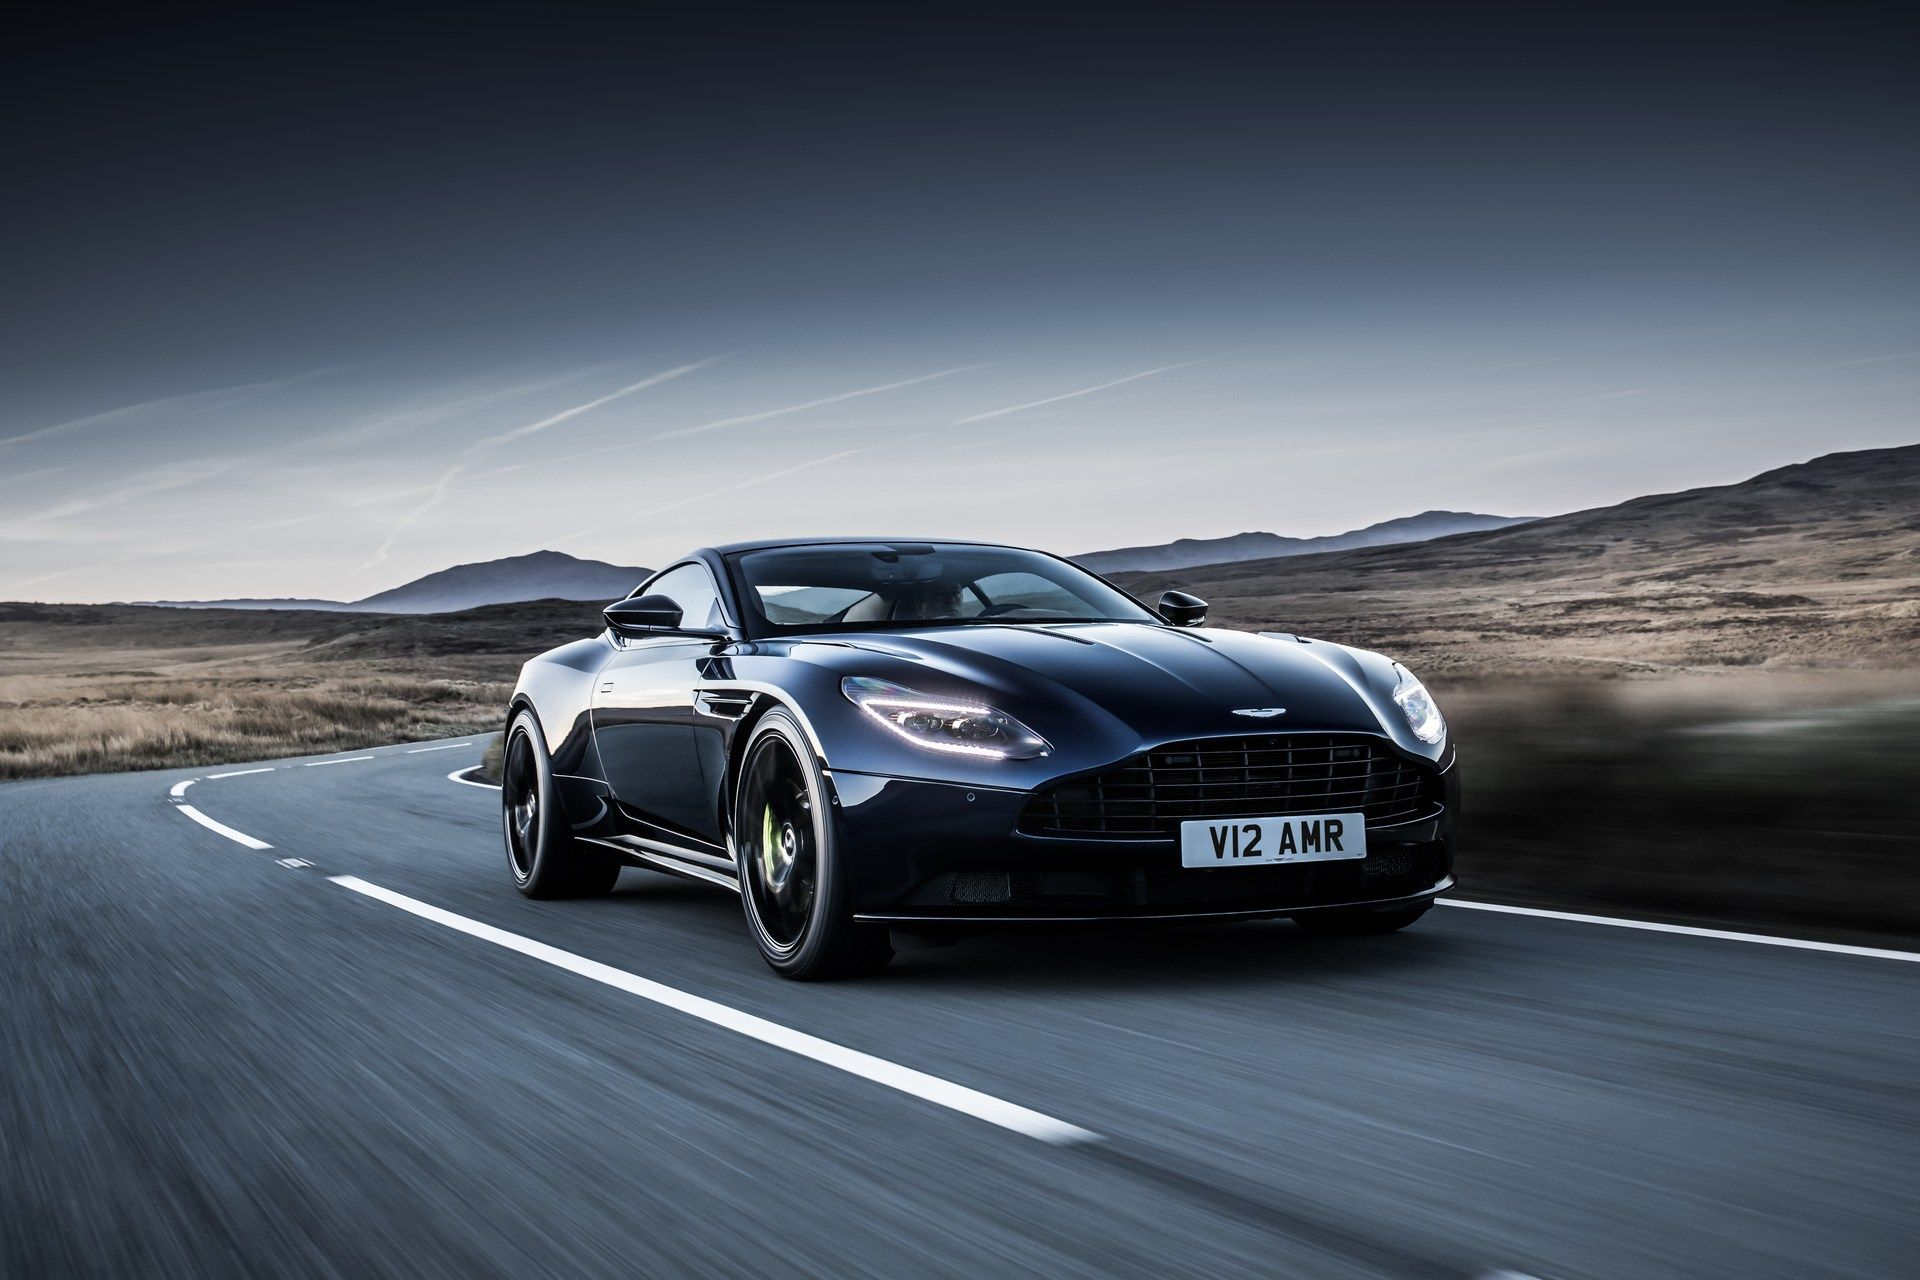 Aston-Martin-DB11-AMR-27